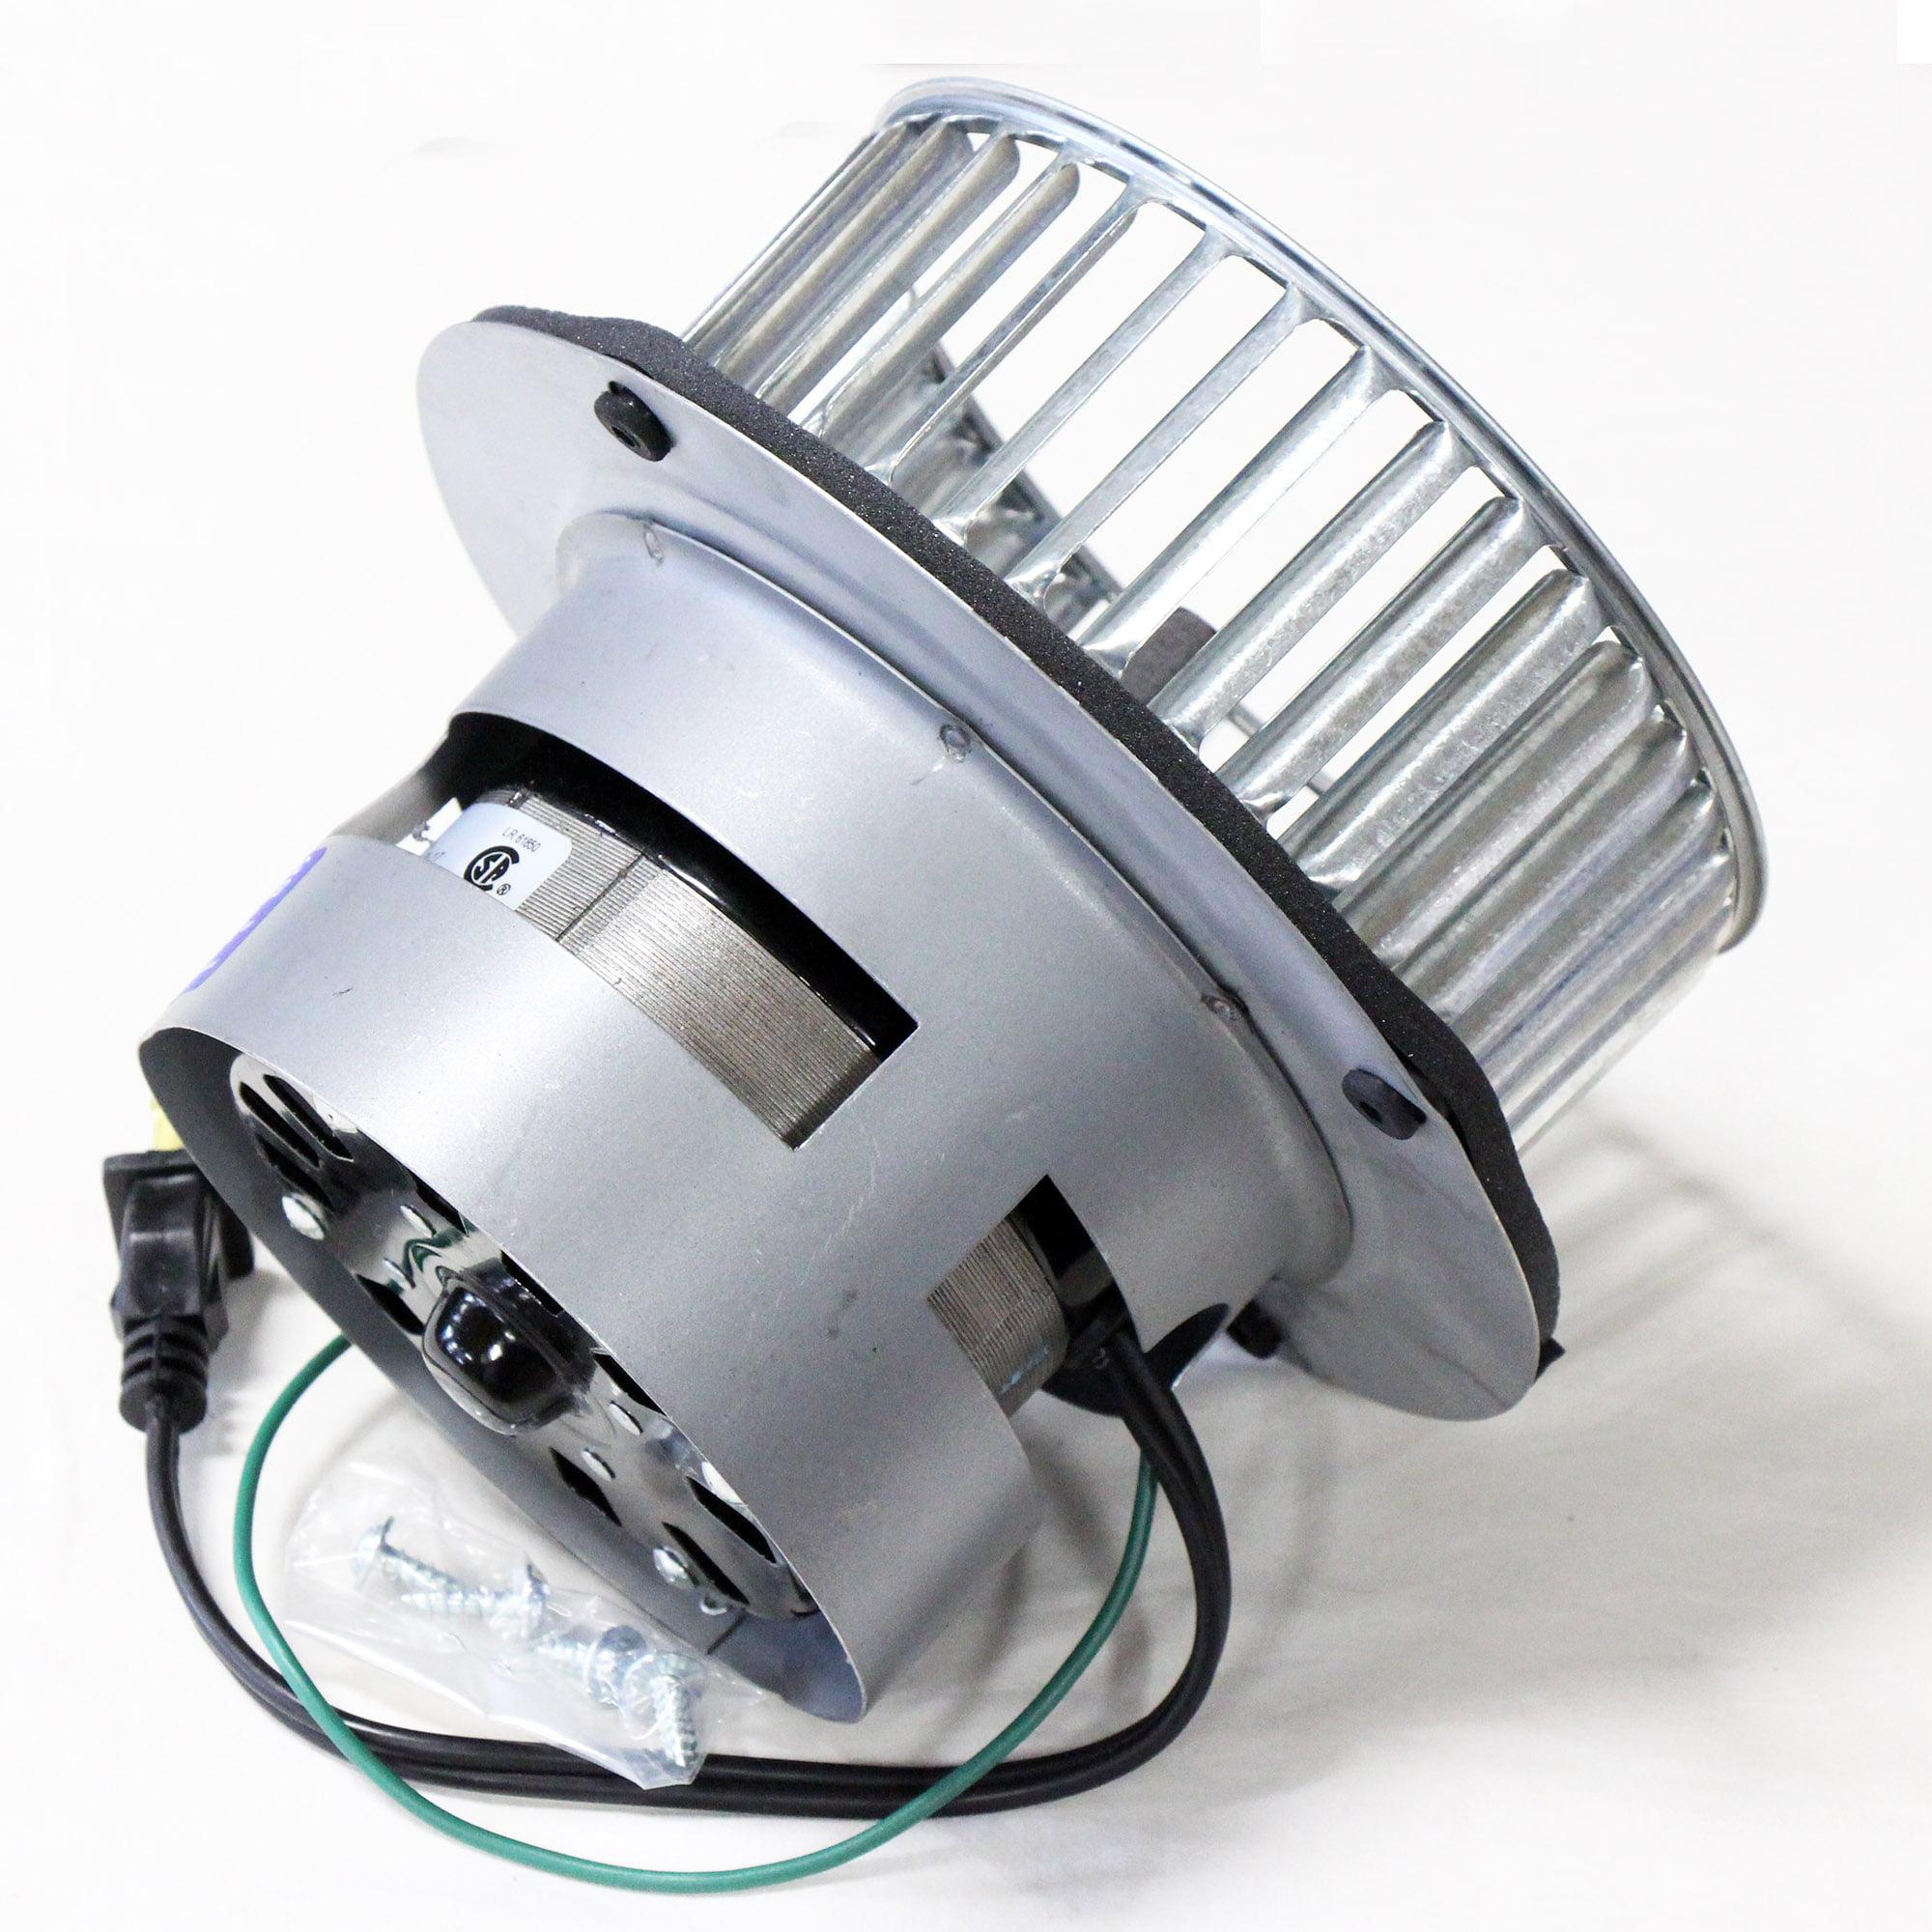 Reversomatic bathroom ventilation exhaust fan motorbladebracketdb200mbb